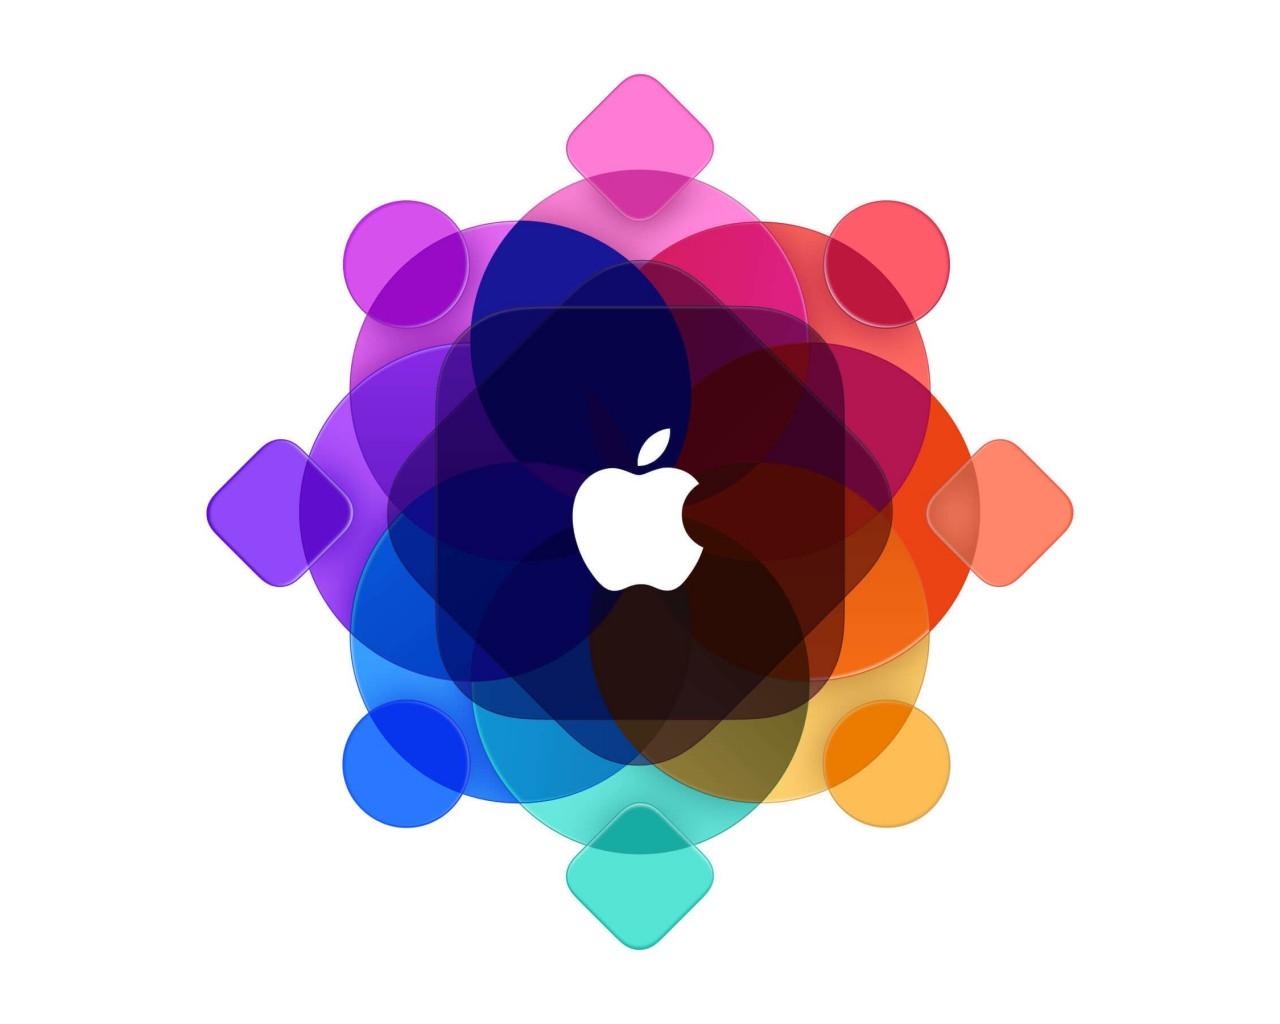 Download Apple WWDC 2015 HD wallpaper for 1280 x 1024